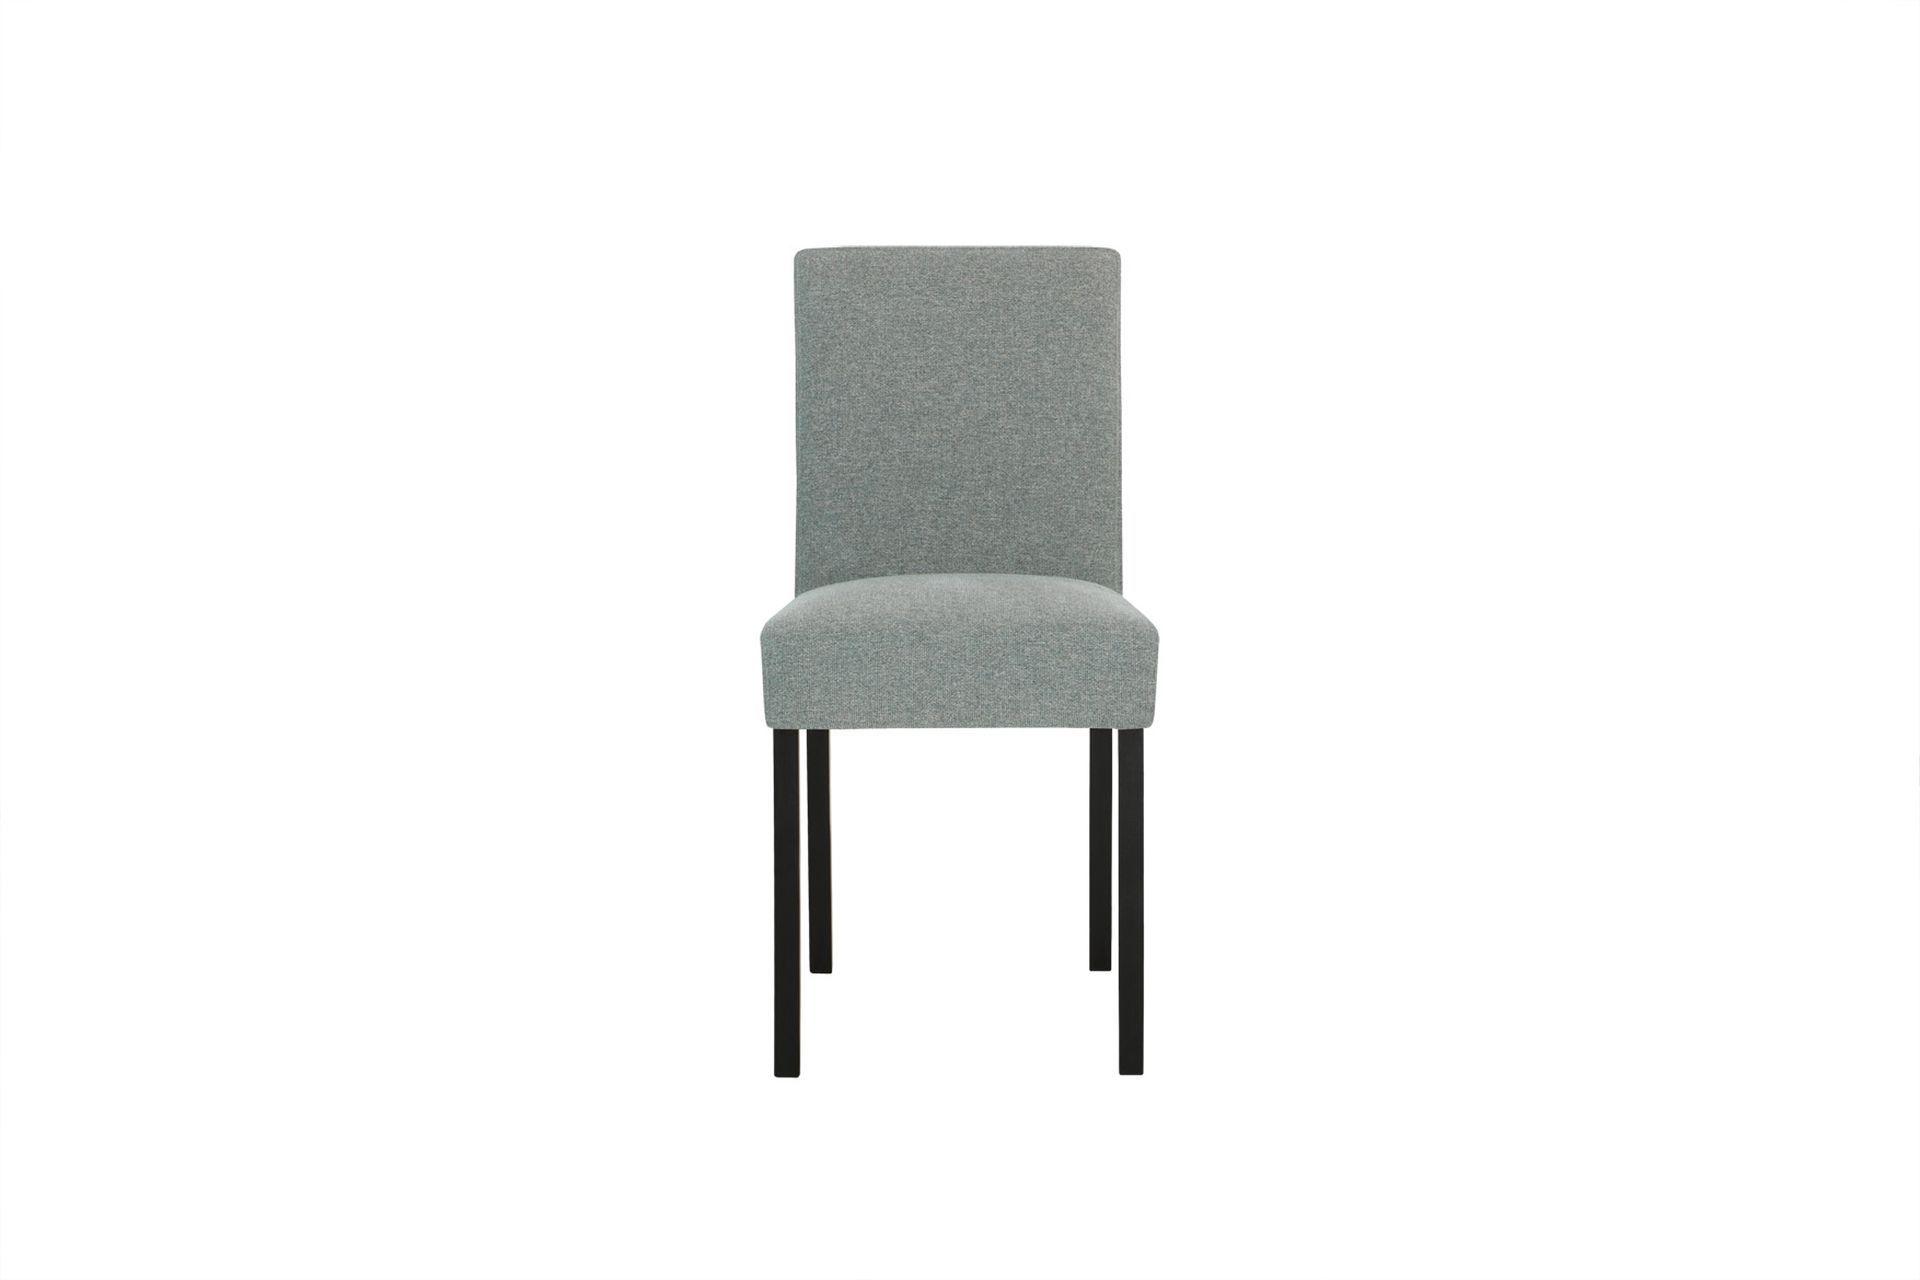 Кухонный стул Sits 15447052 от thefurnish